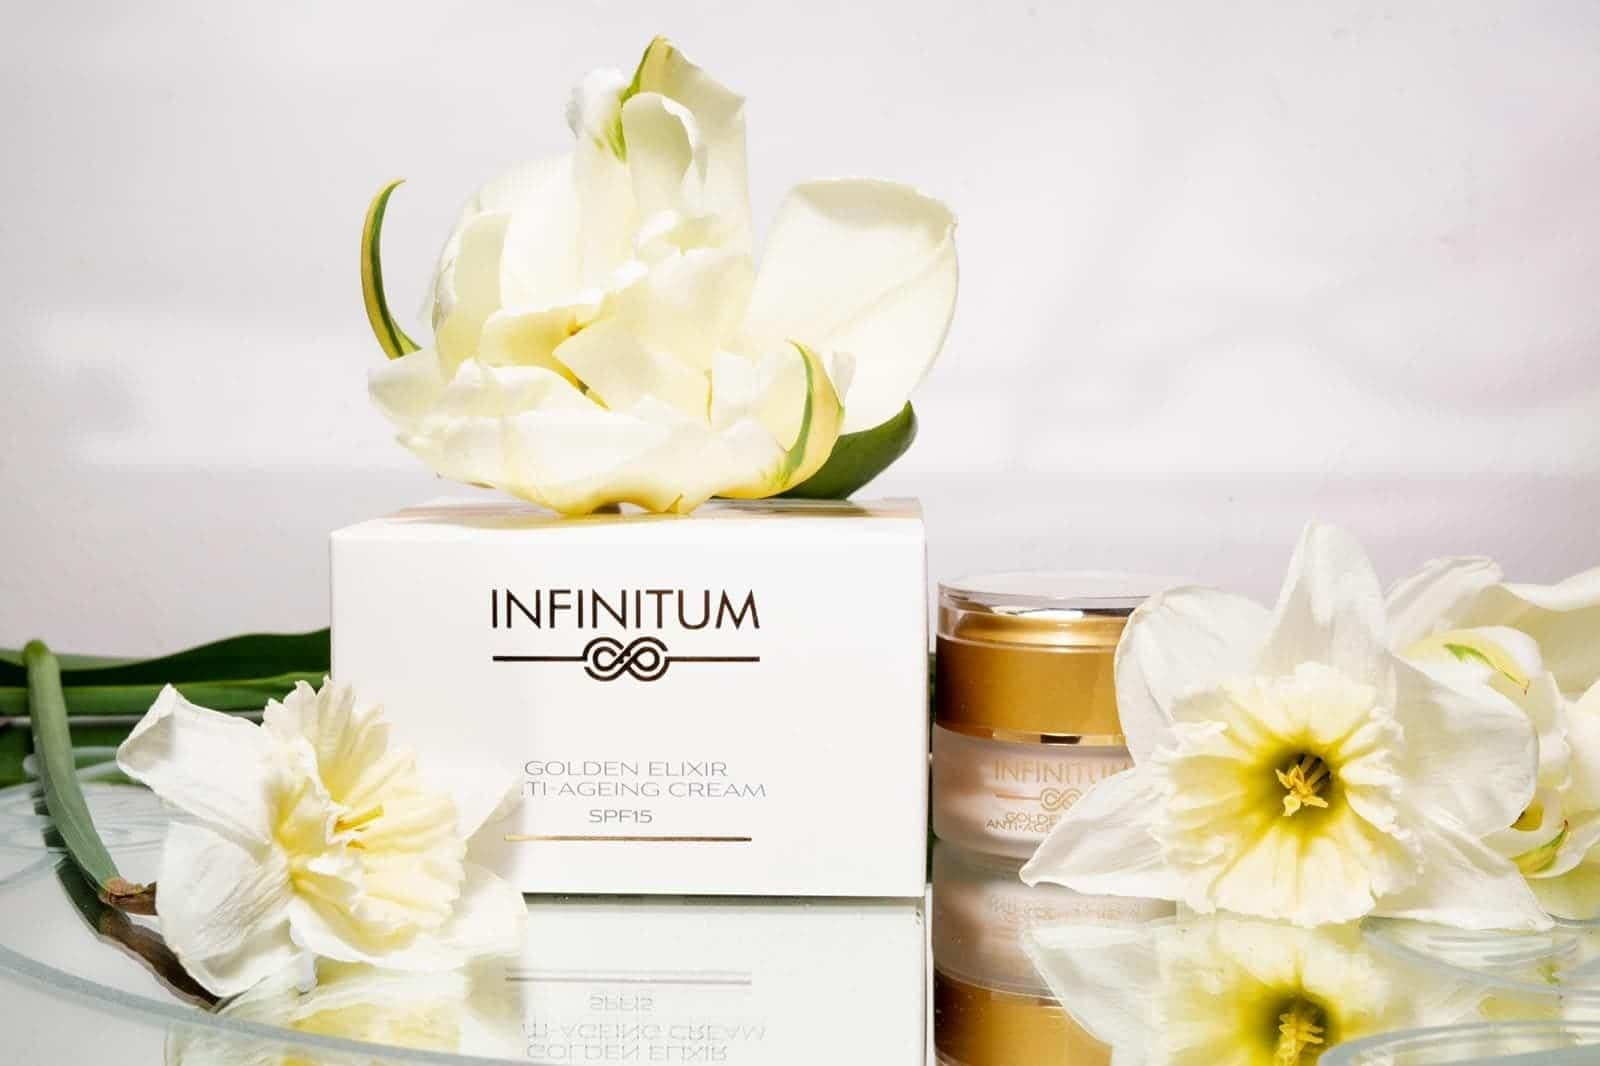 golden elixir anti-ageing cream